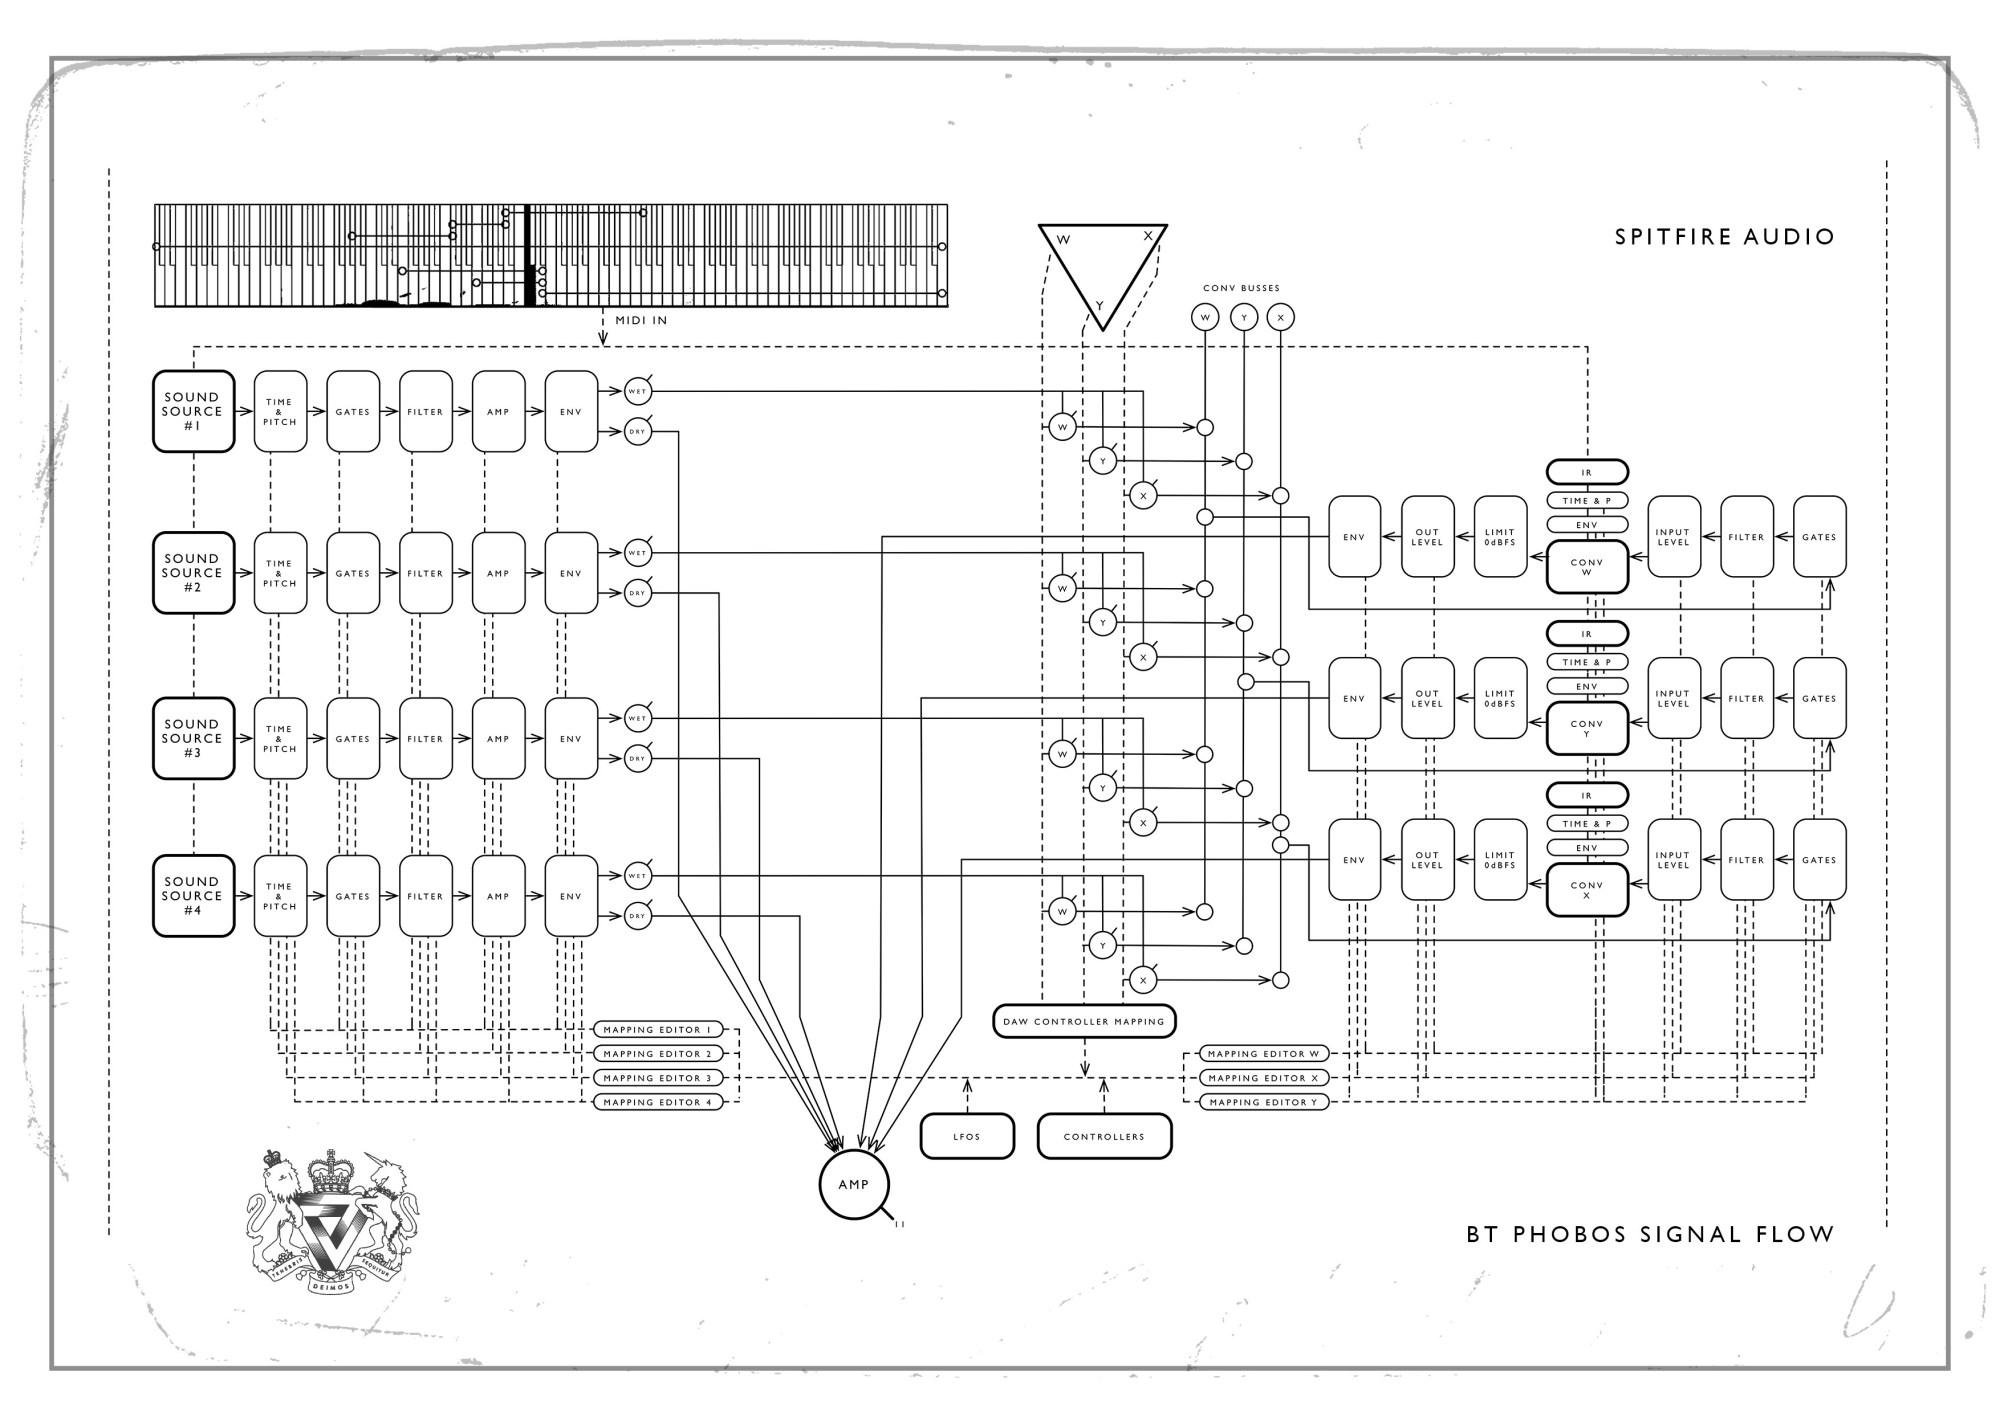 hight resolution of vdp sound bar wiring diagram wiring diagram third levelvdp sound bar wiring diagram wiring diagrams simple